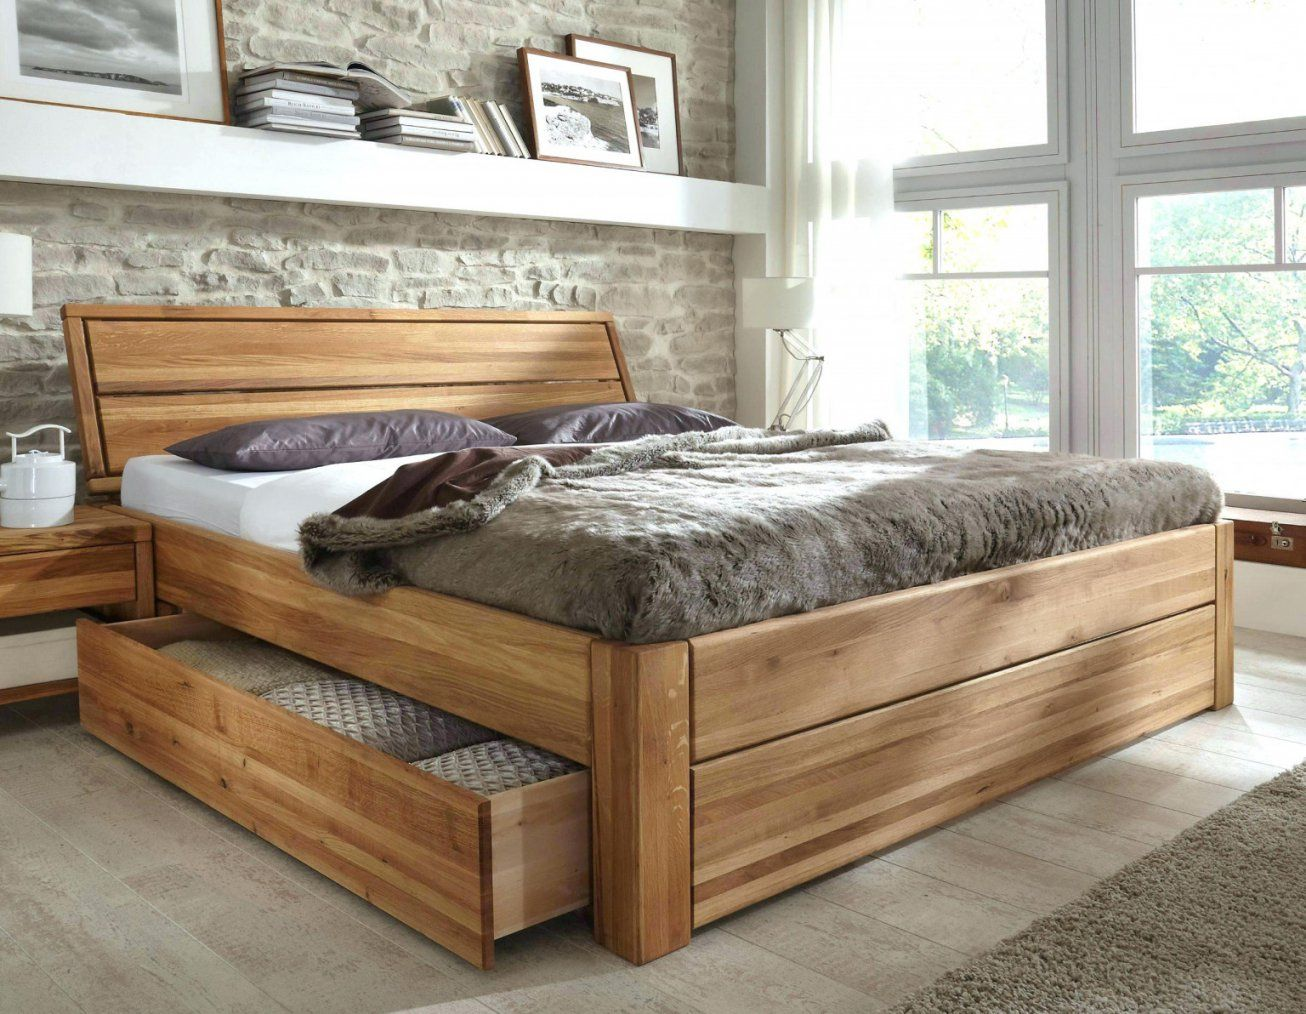 Bett Mit Stufen Selber Bauen Perfekt Kura Bett Umbaufhig Ikea Fr von Bett Mit Stufen Selber Bauen Bild